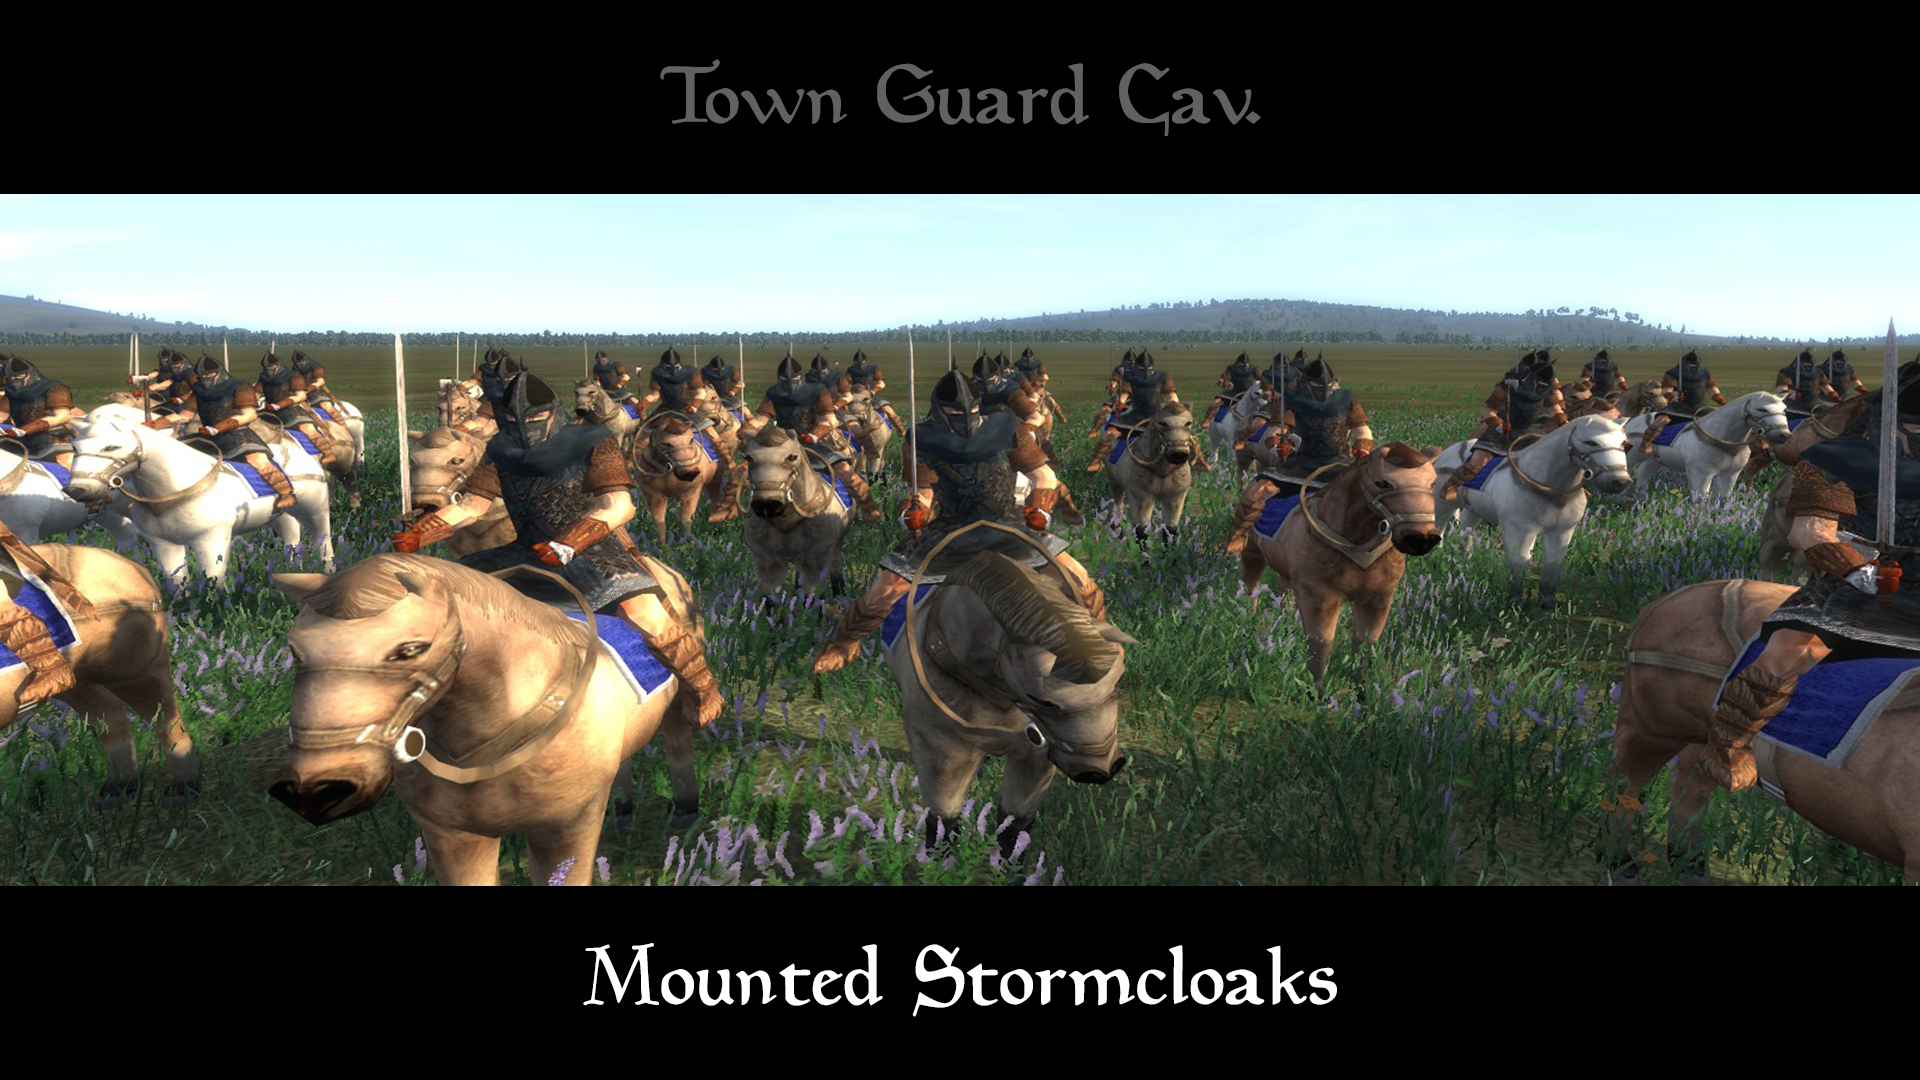 mounted stormcloaks